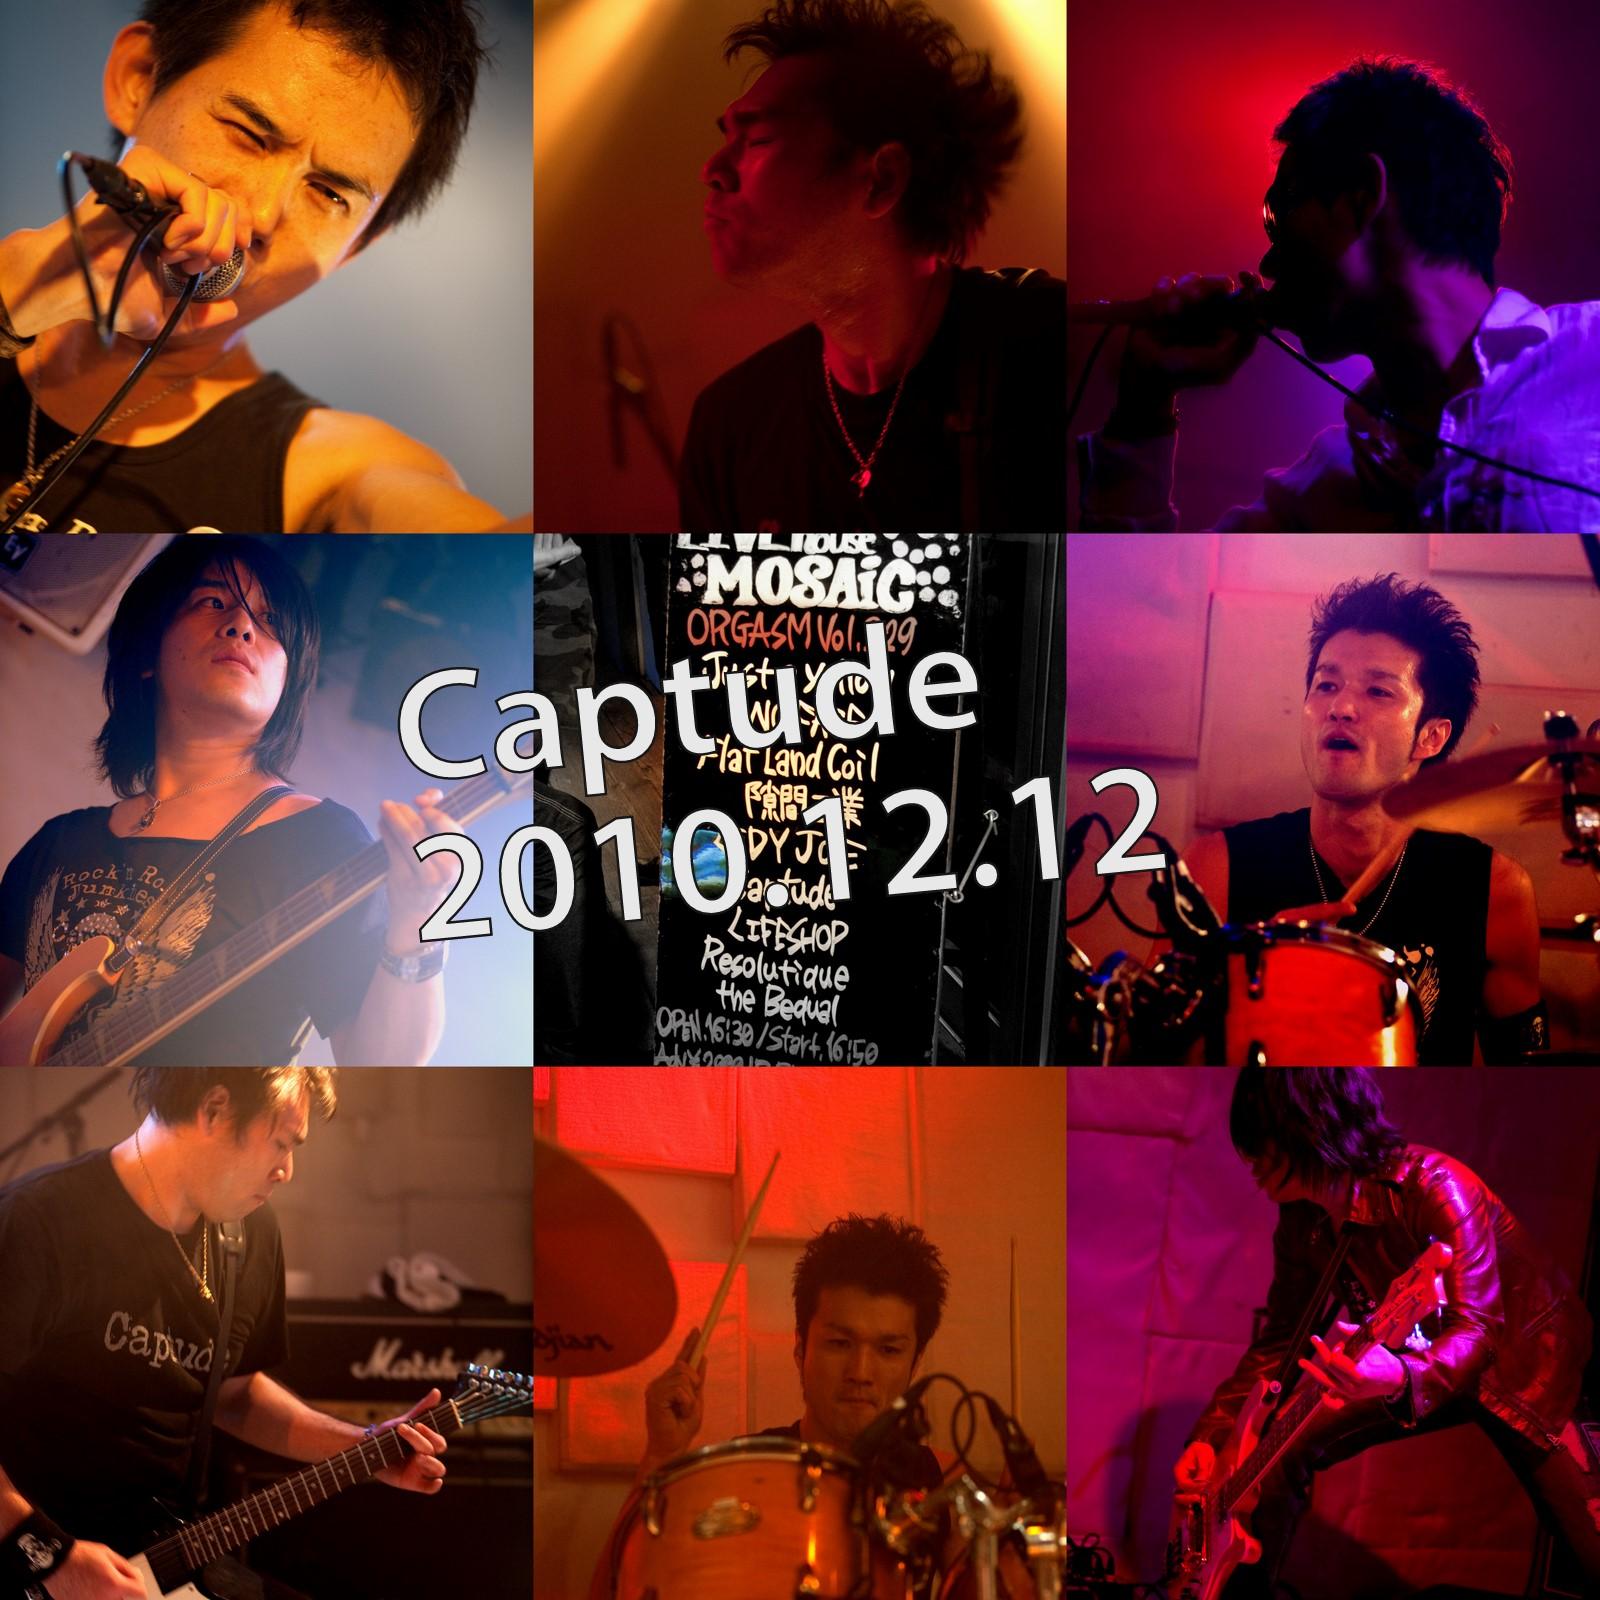 20101212